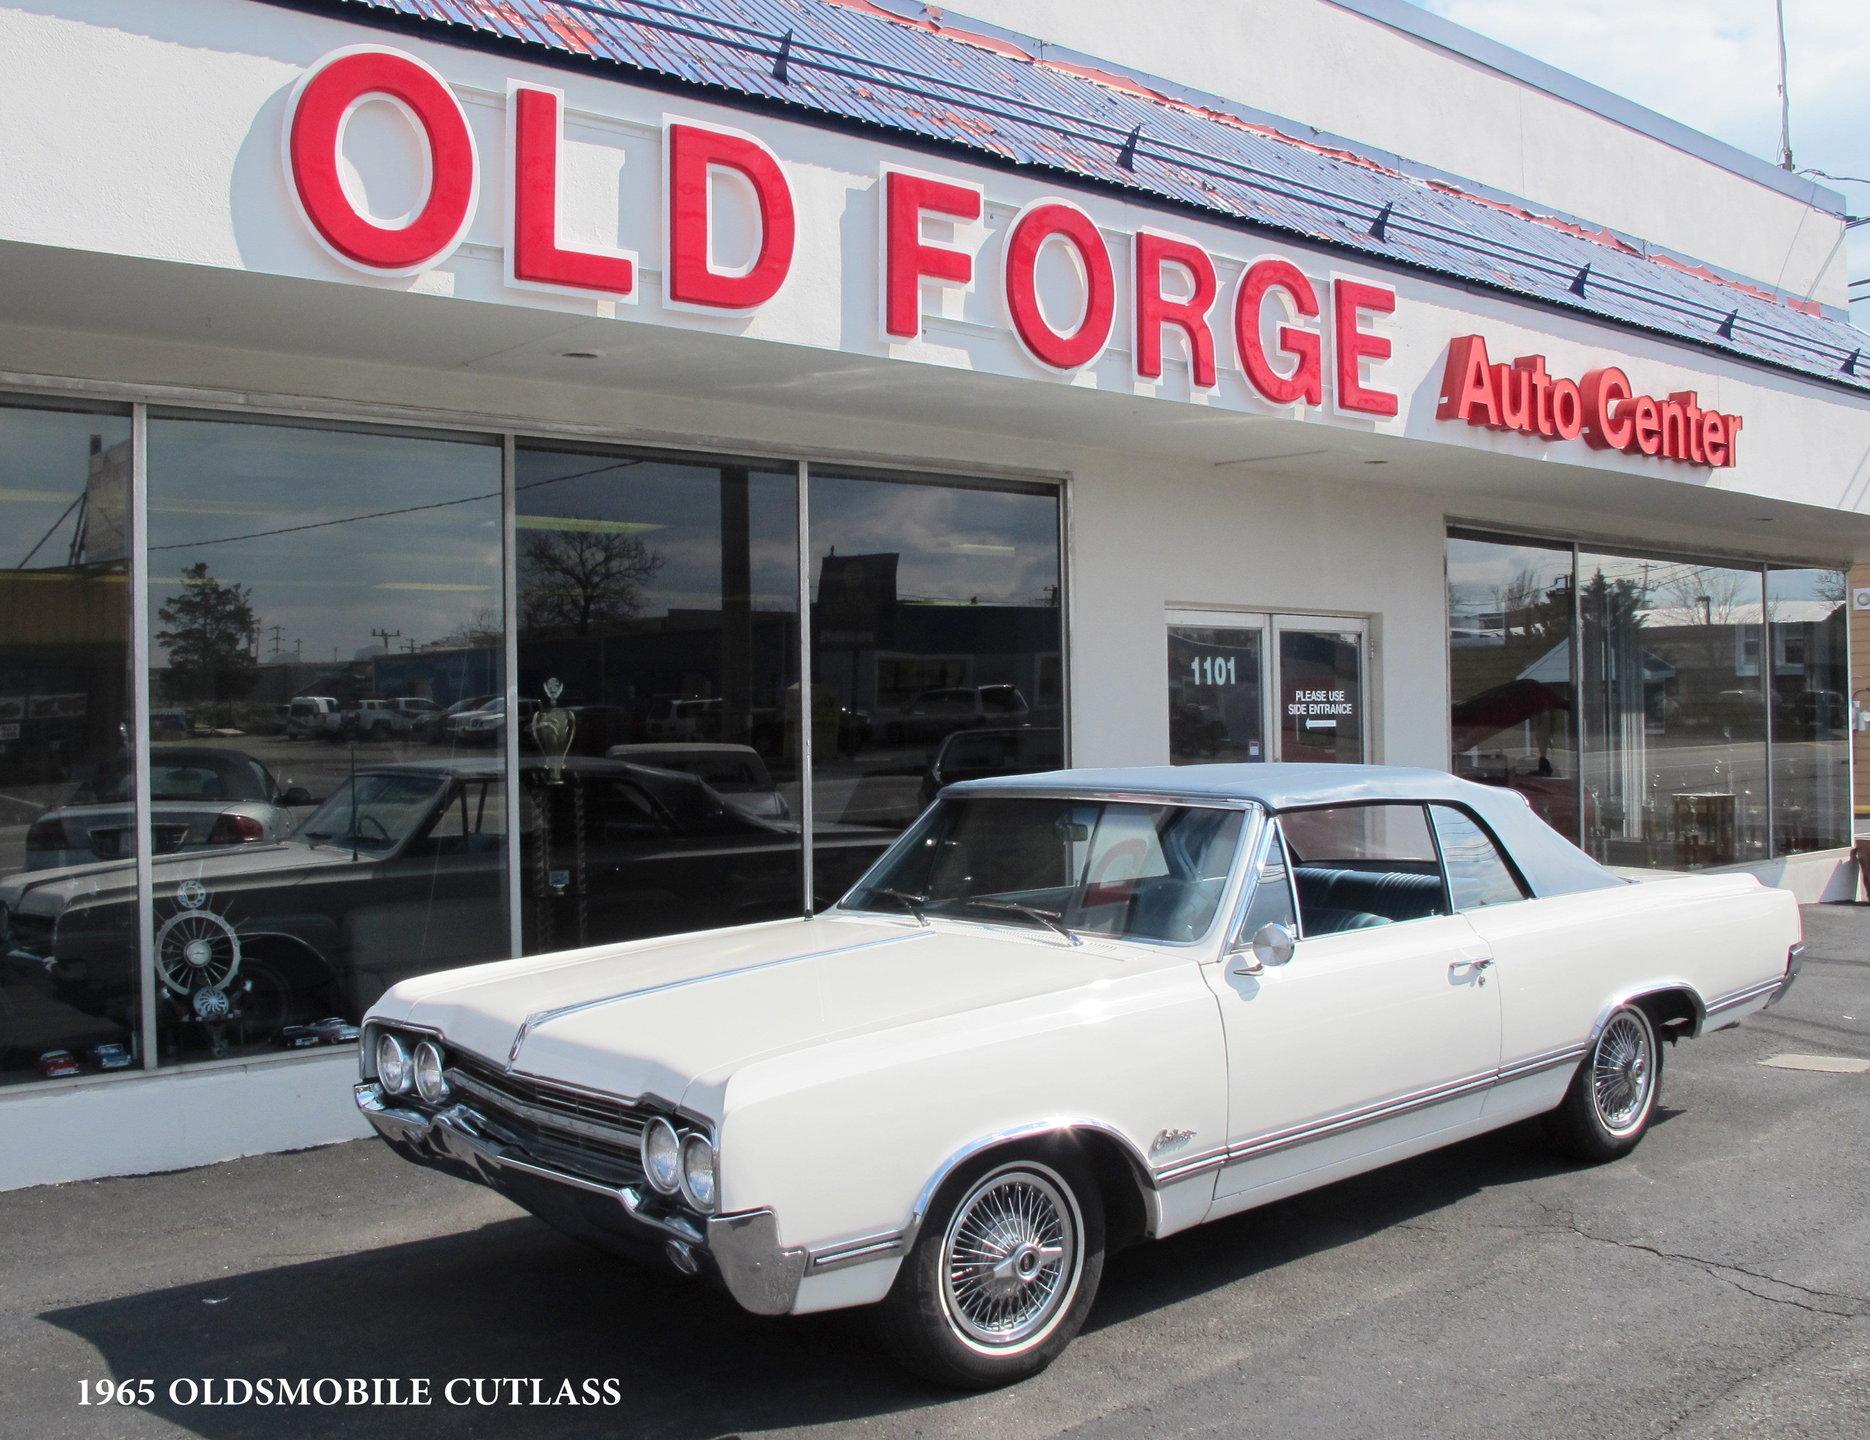 21081f7a6950e hd 1965 oldsmobile cutlass